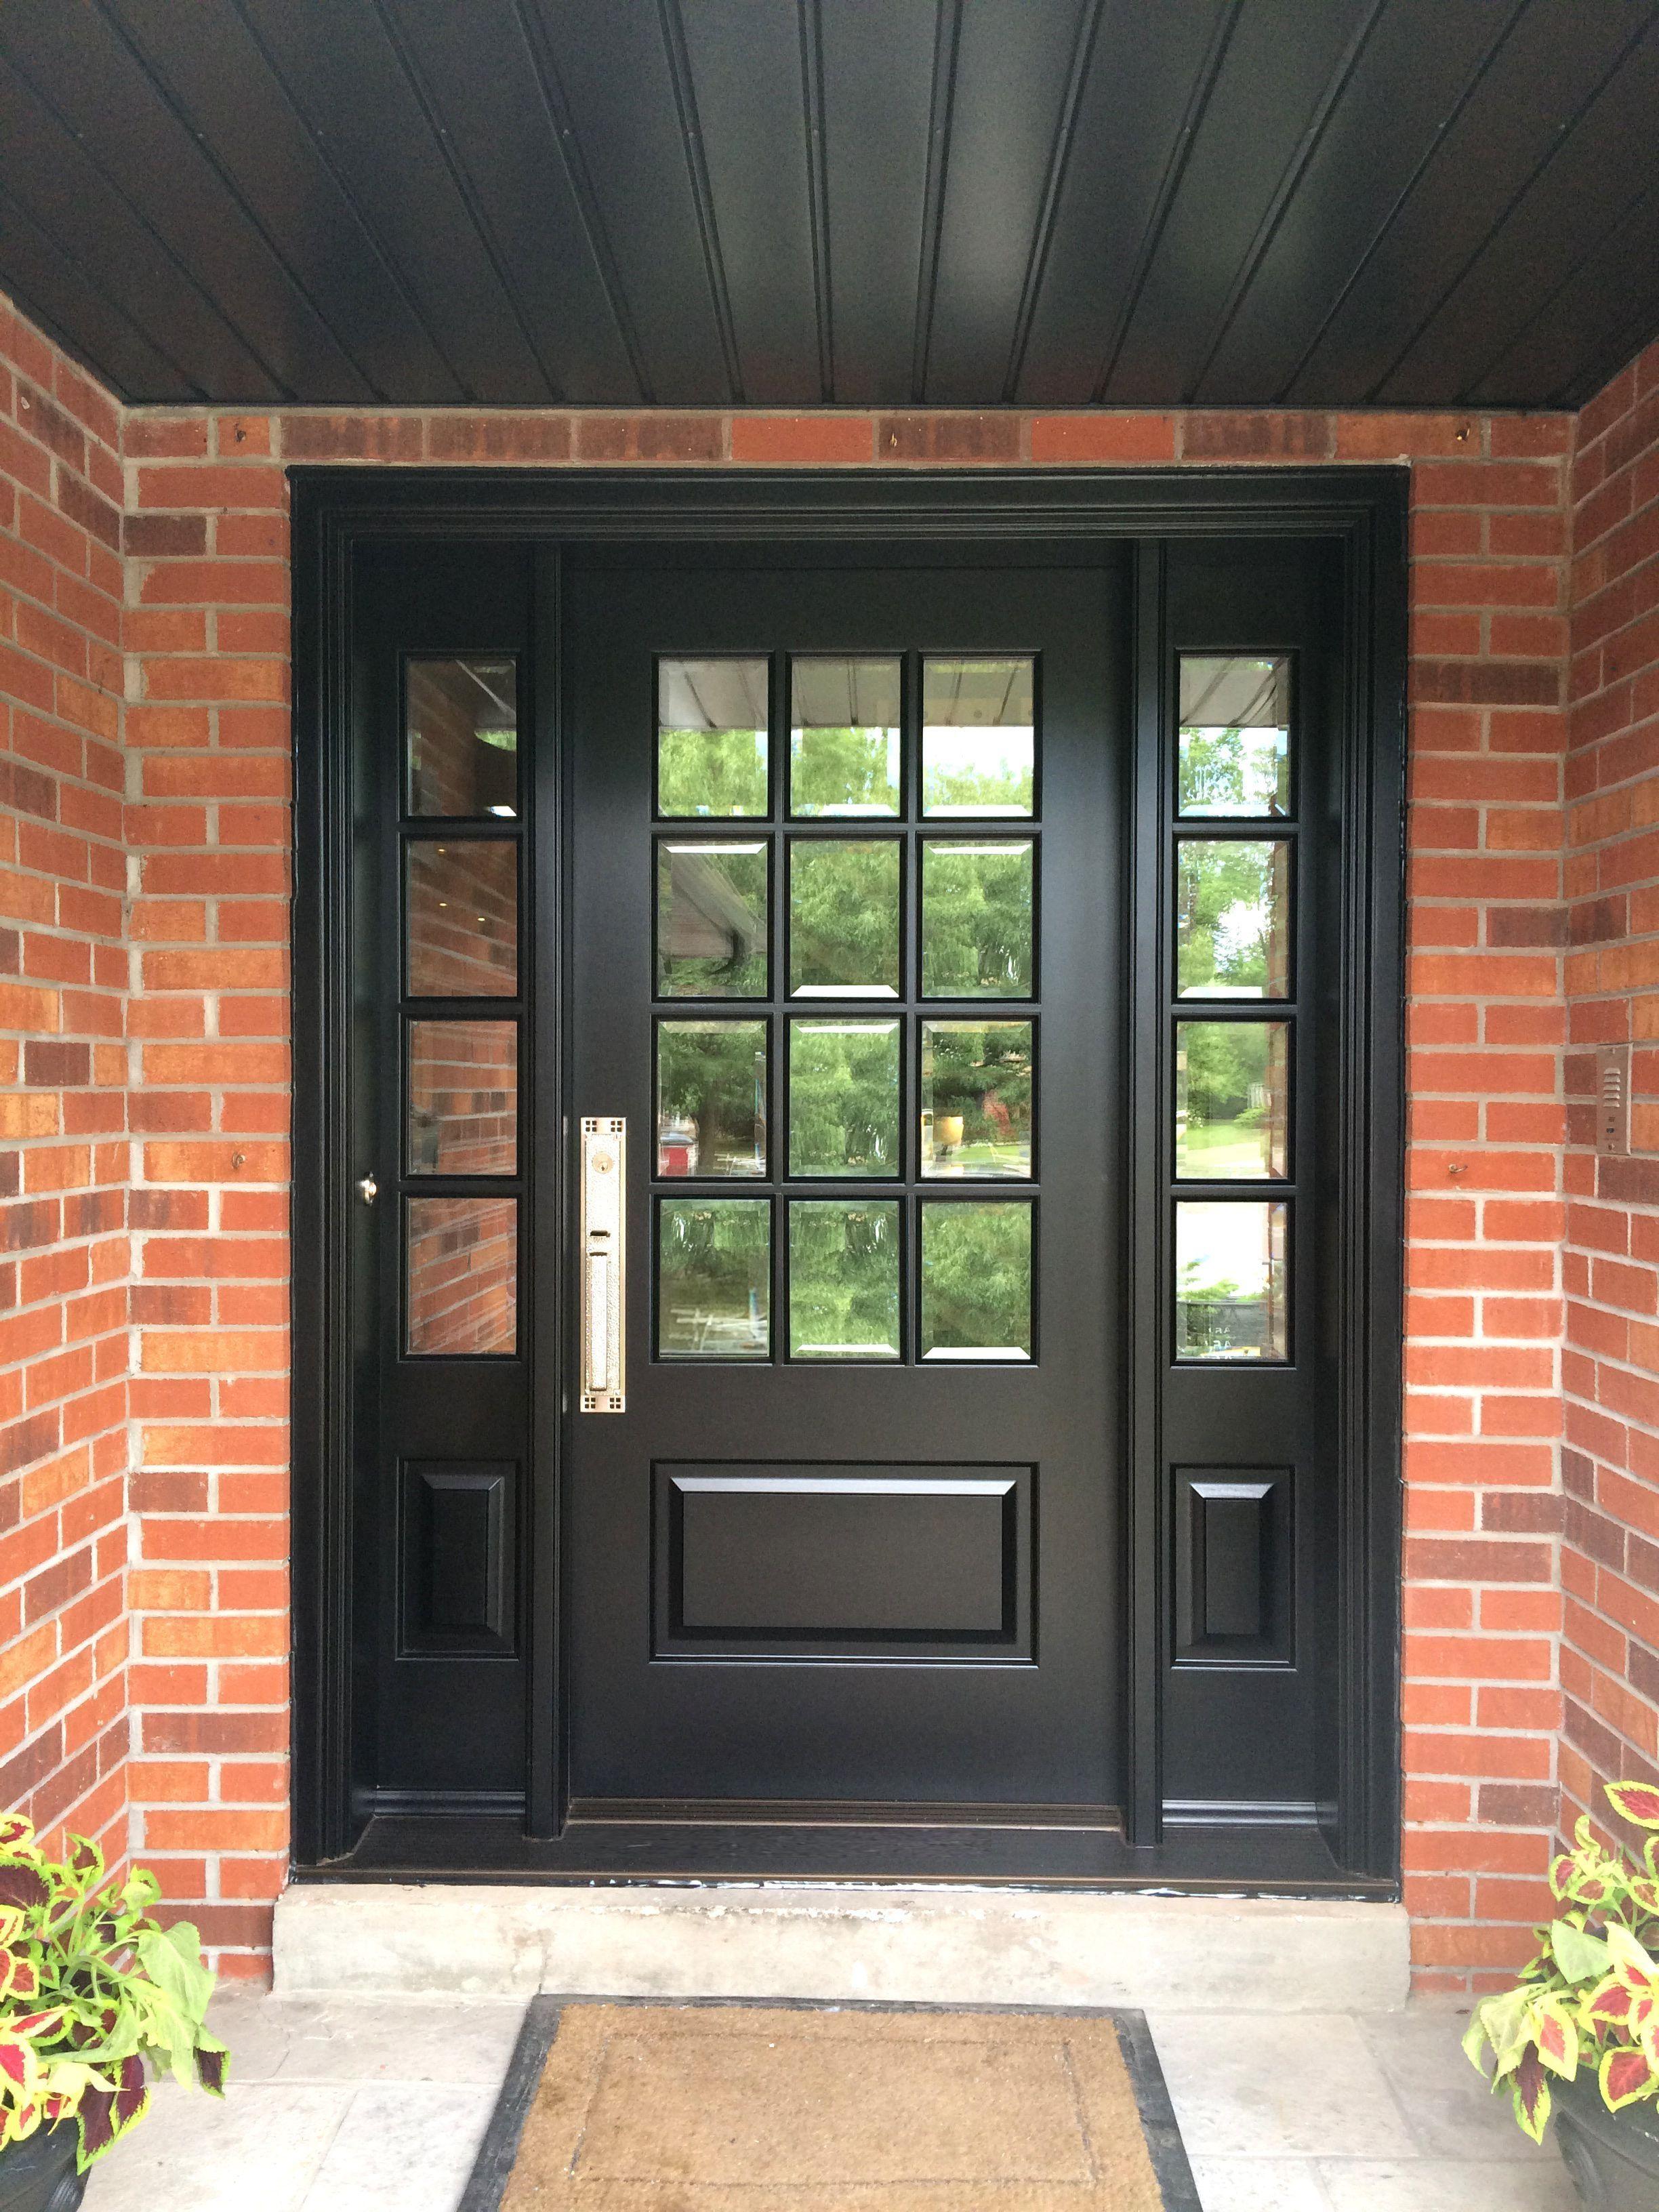 45 Fantastic Exterior Door Ideas With Windows Brick Exterior House Black Exterior Doors Exterior Doors